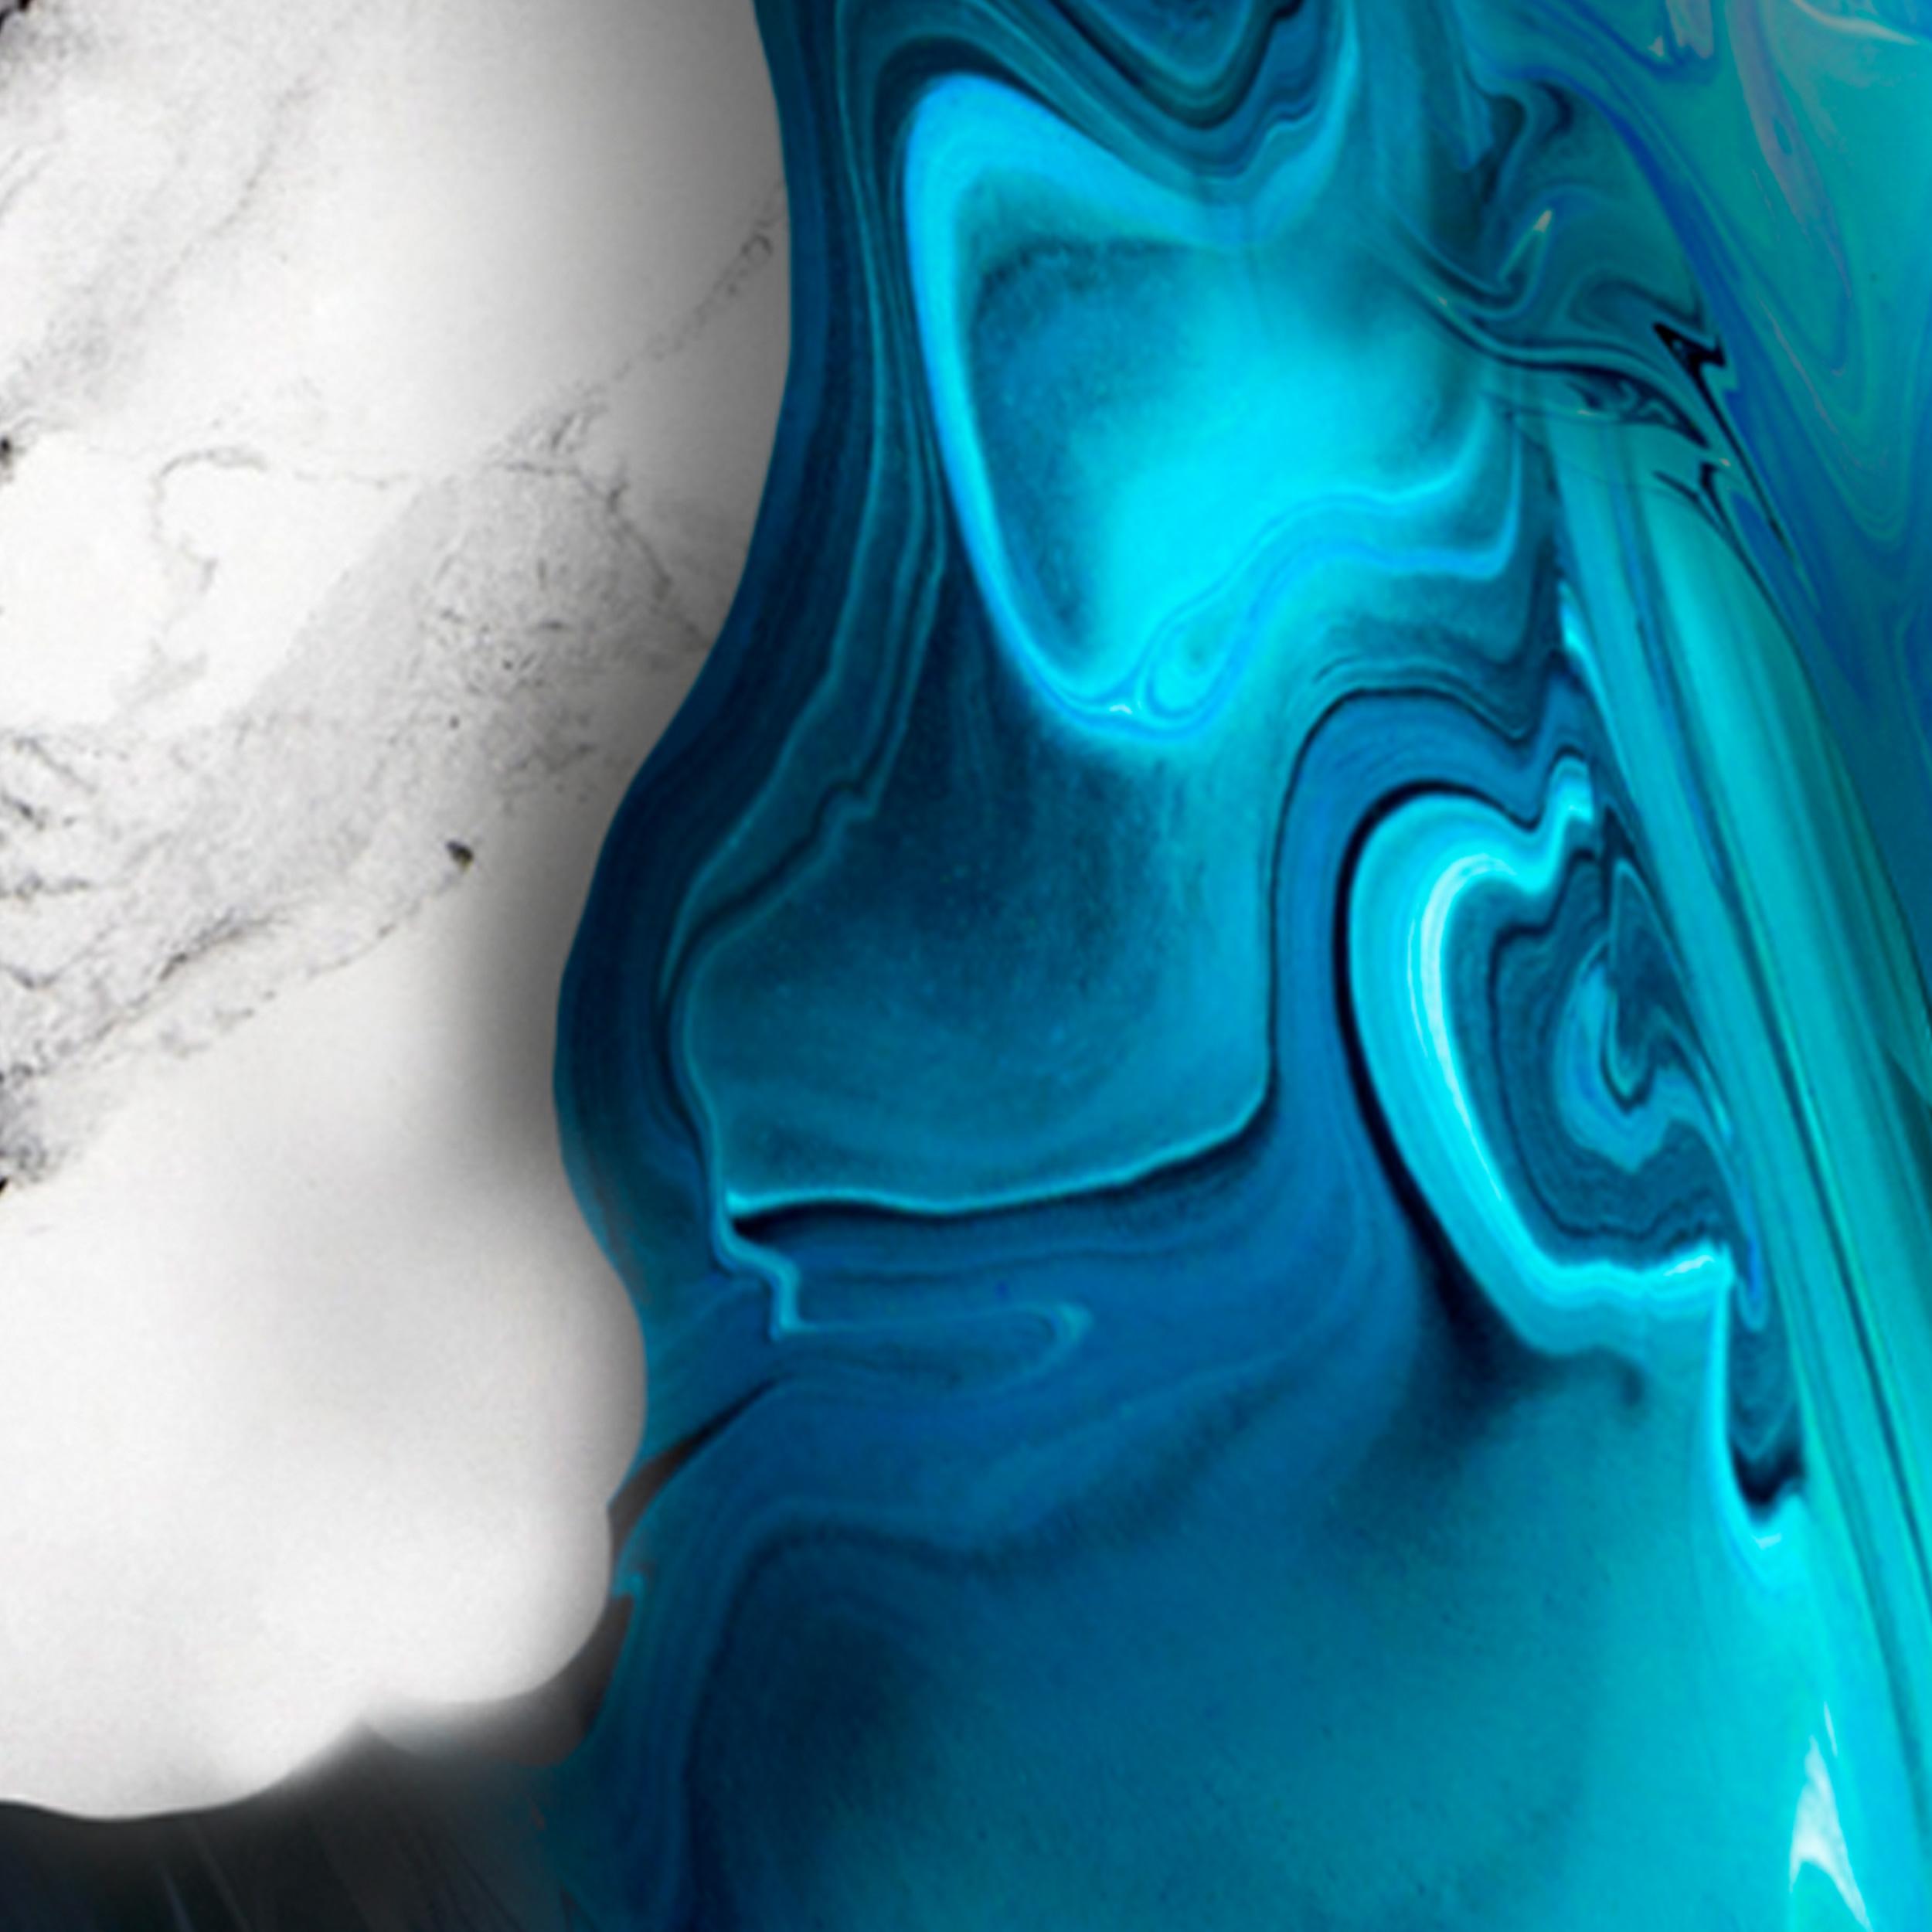 Marmor HOLZ LEINWAND Deko Bilder Abstrakt XXL Wandbilder KUNST Druck Bild 5Motiv